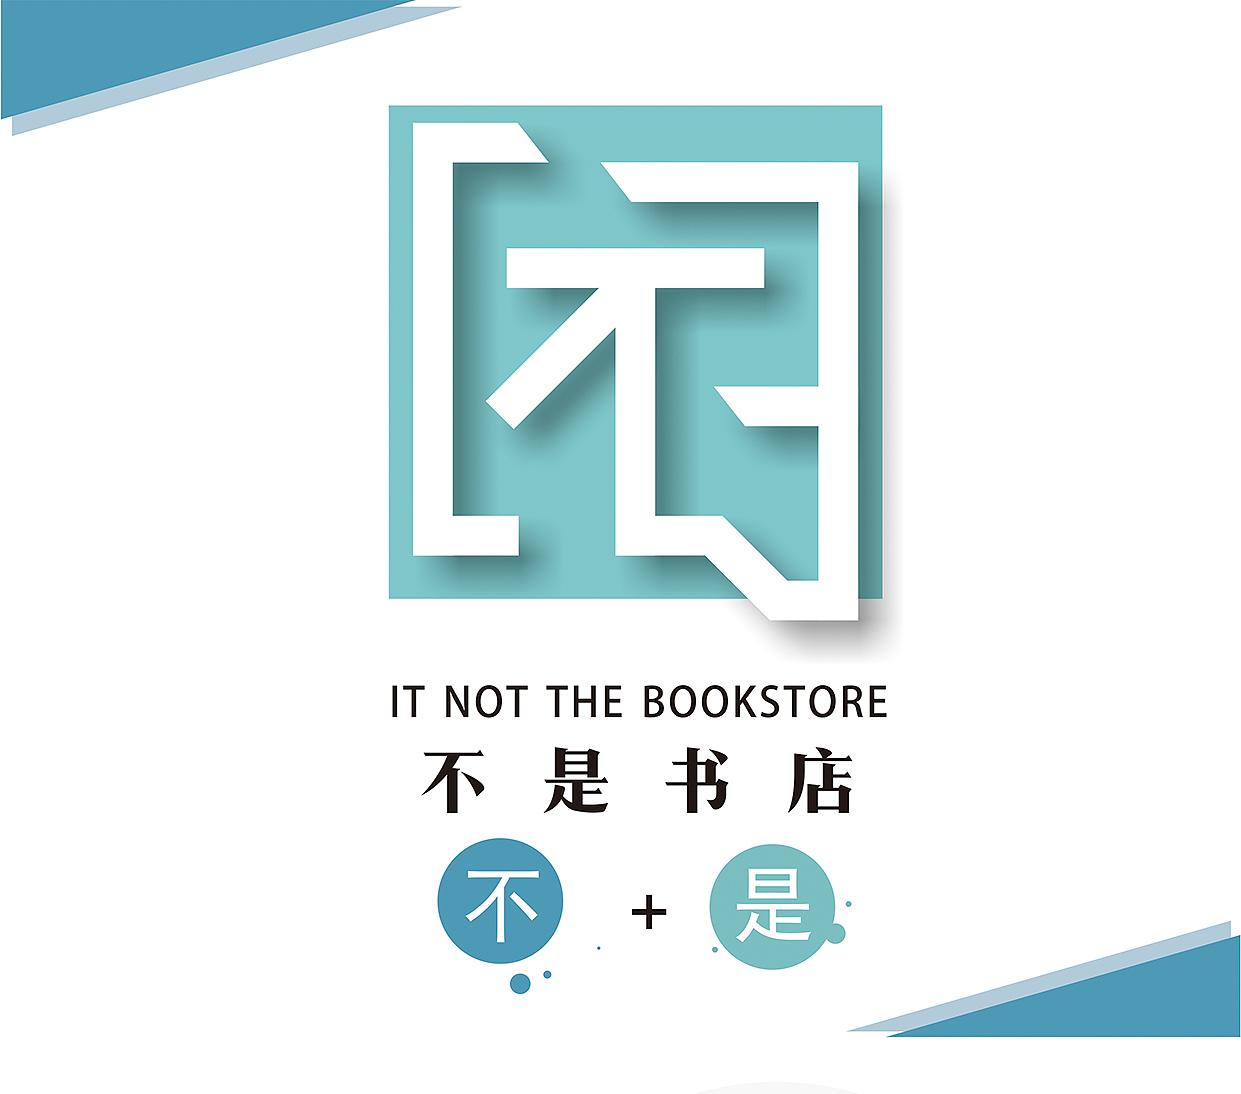 �ycj�`�_不是书店vi设计 平面 品牌 空白cj - 原创作品 - 站酷